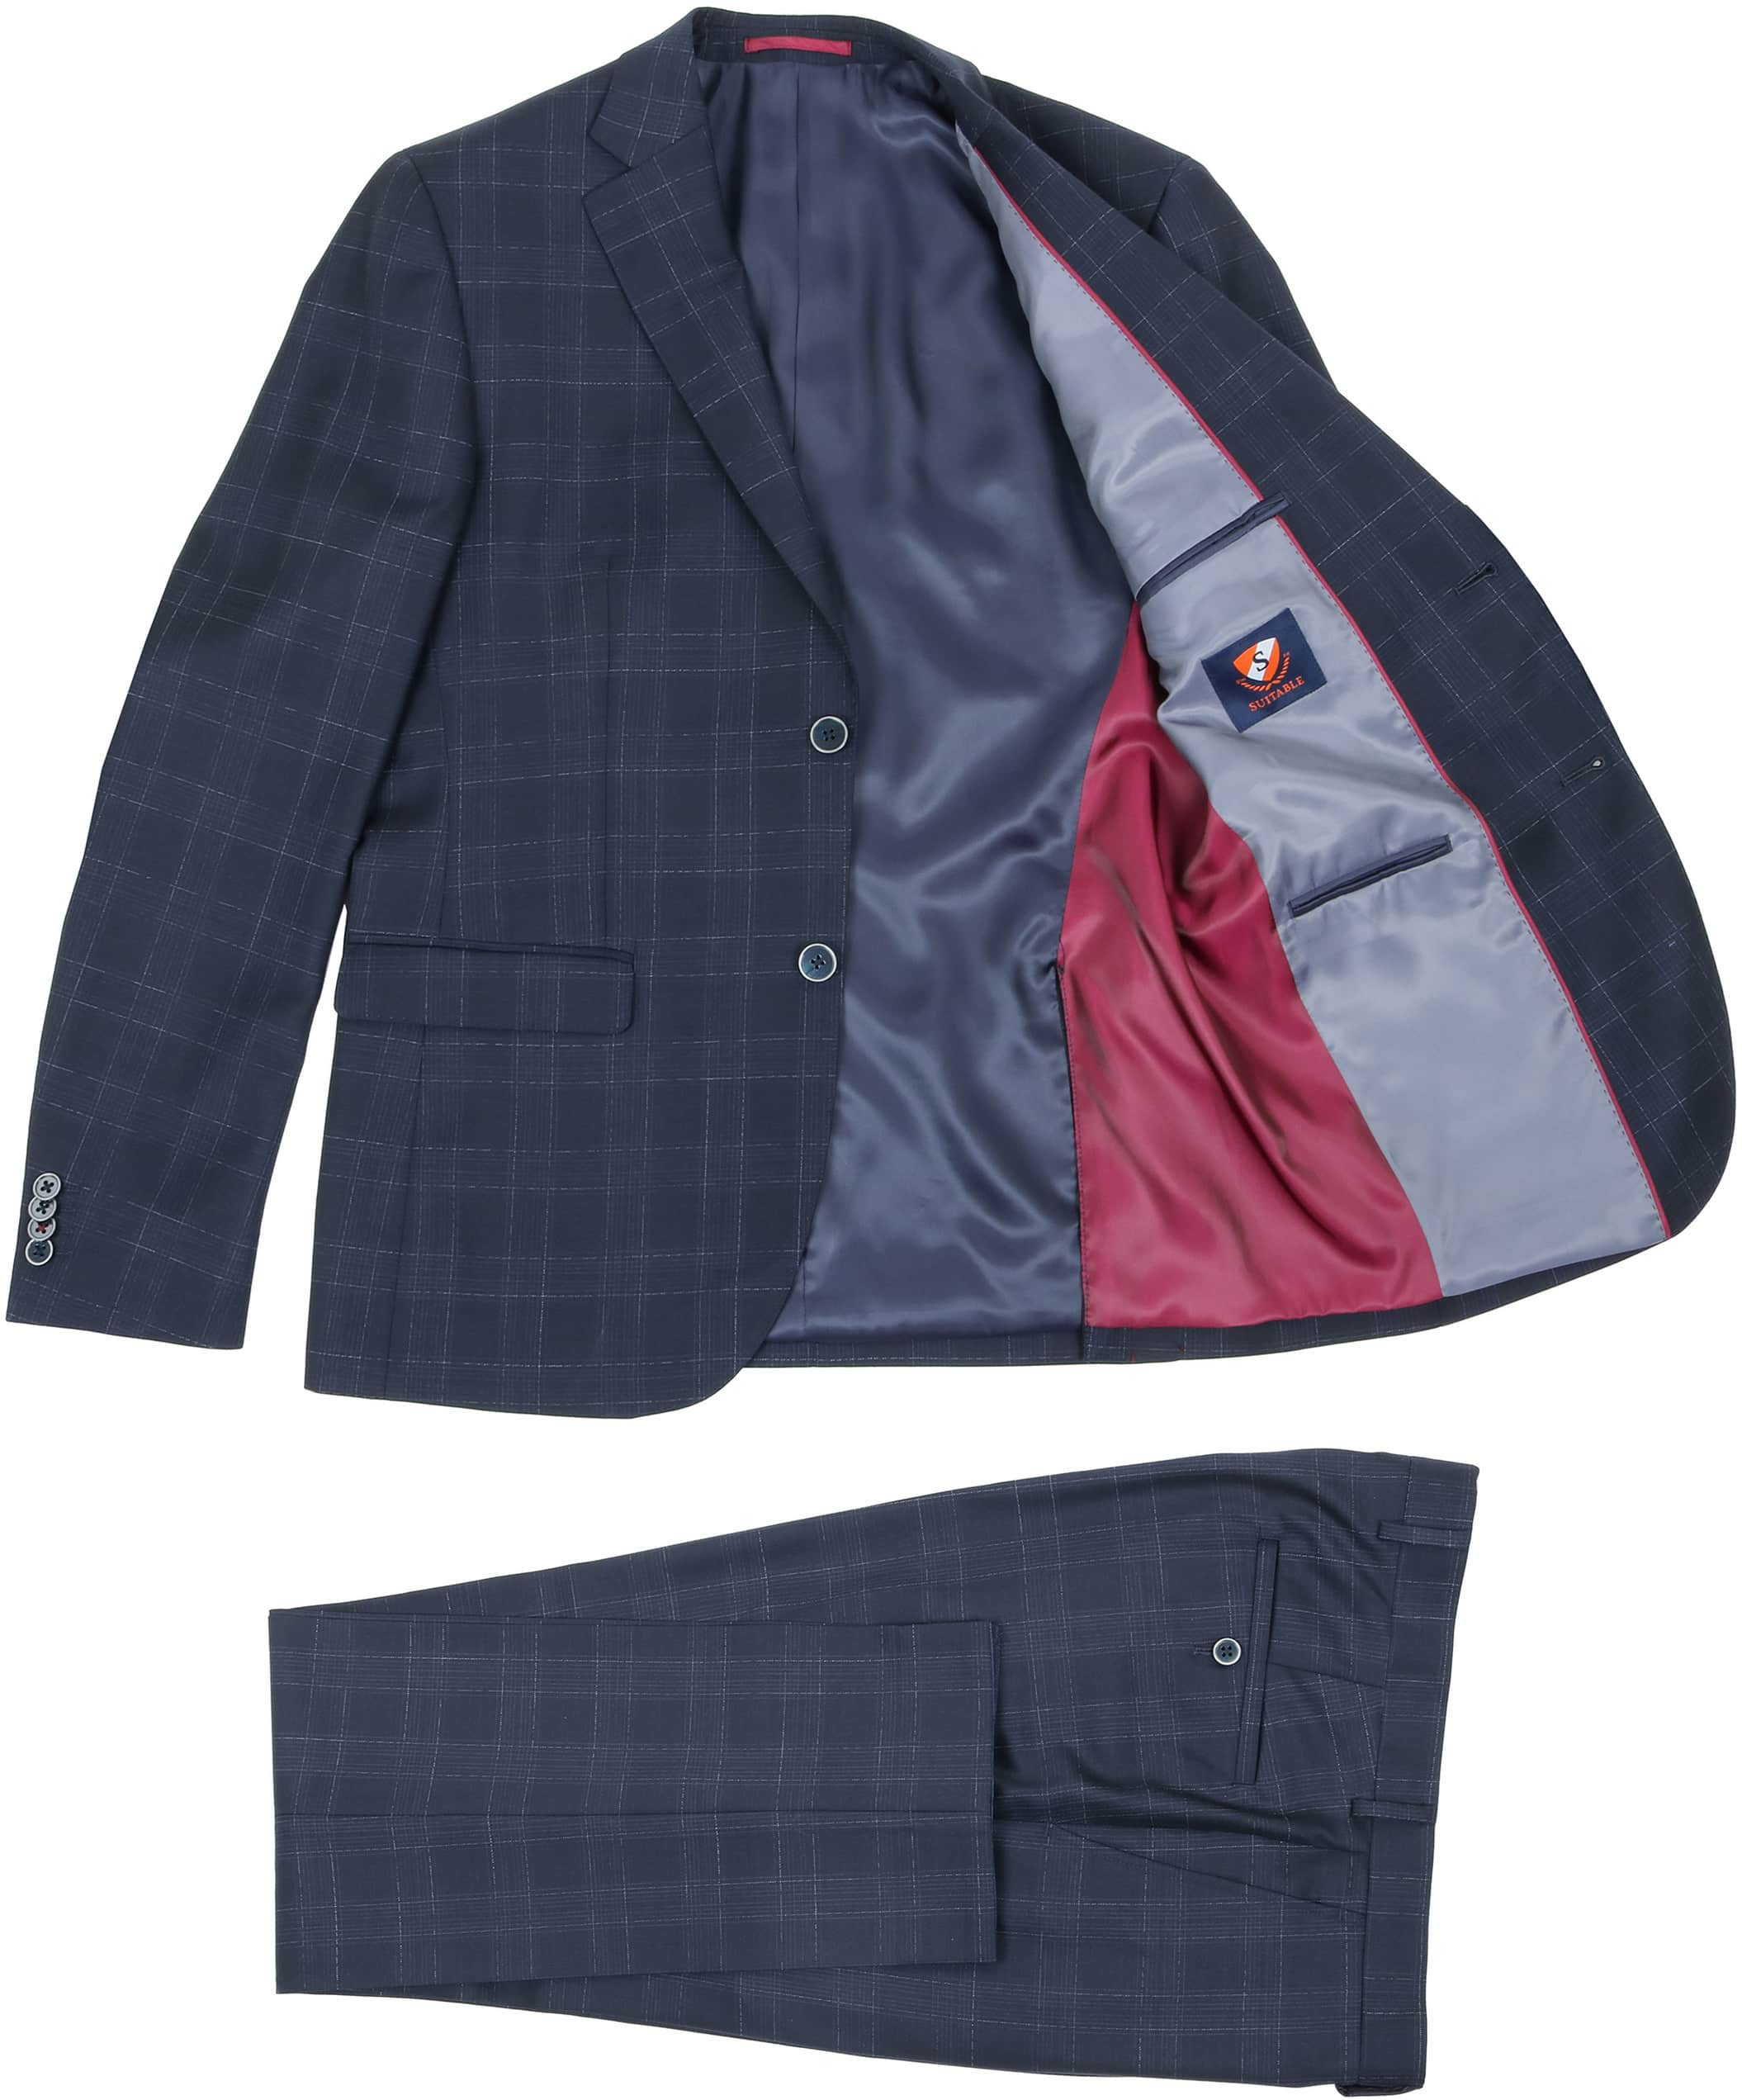 Suitable Suit Zurich Dark Blue foto 1